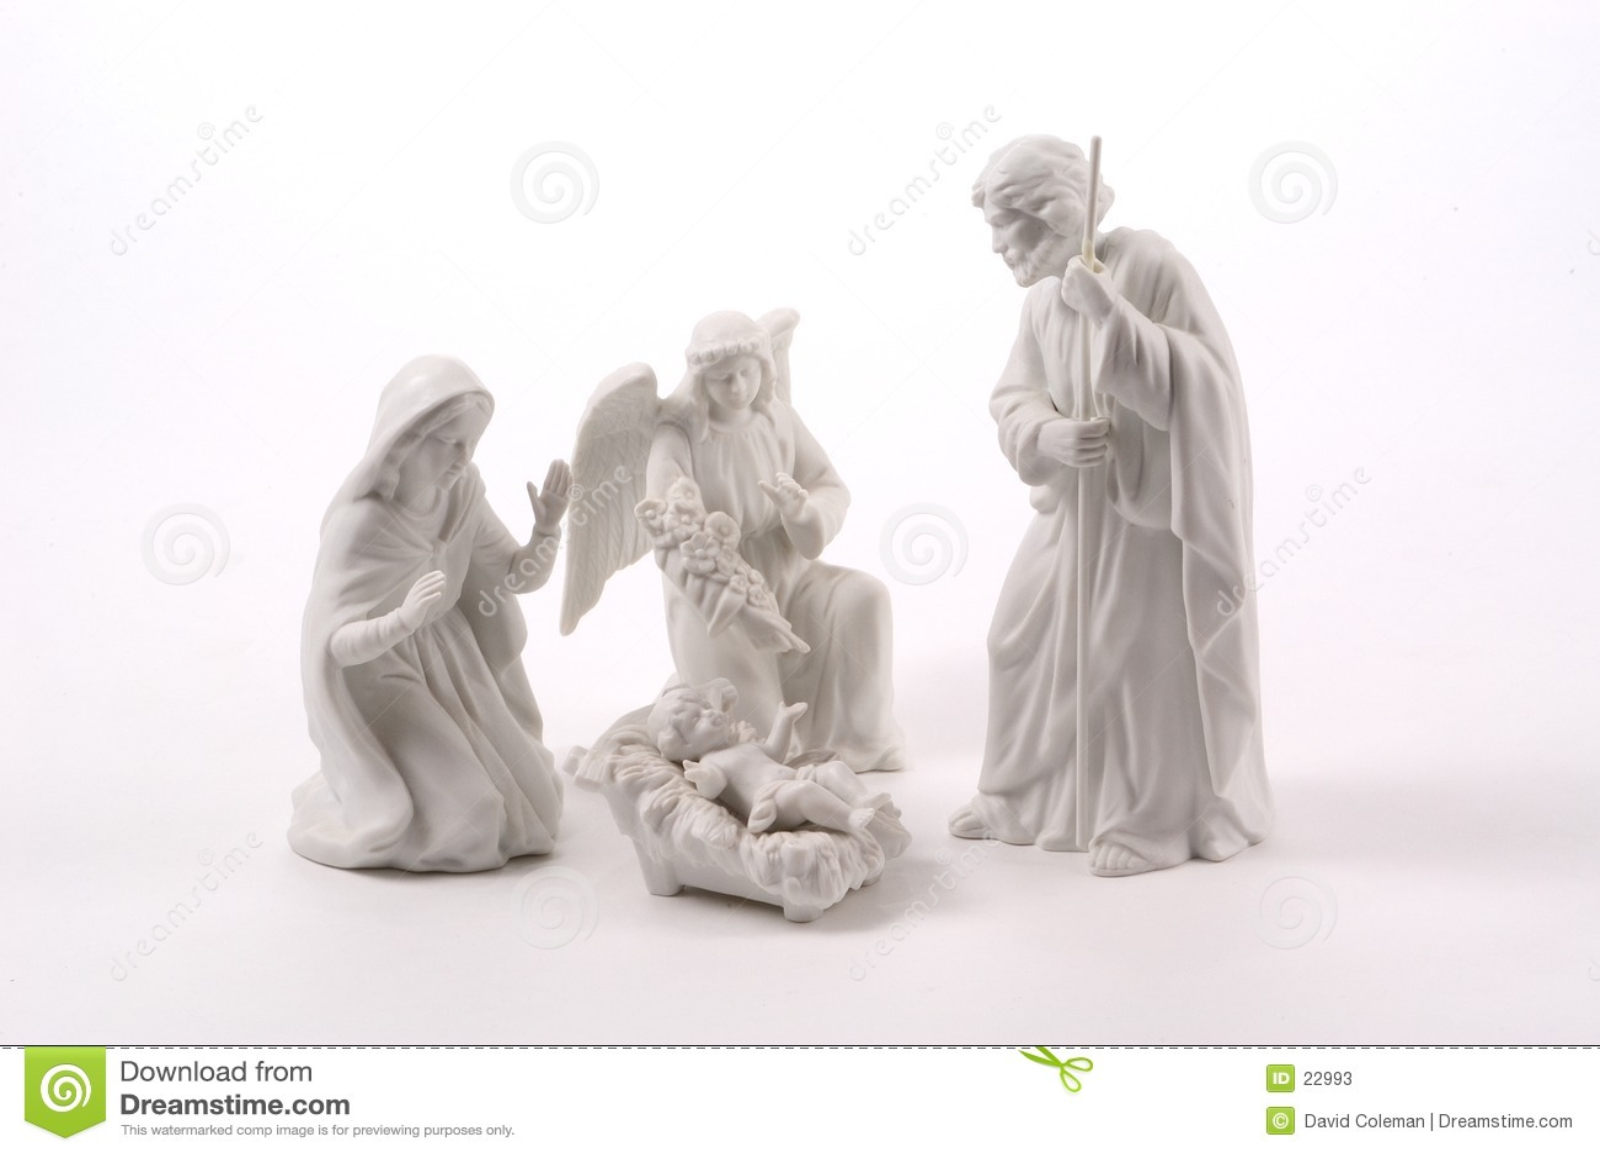 Petite scène de nativité